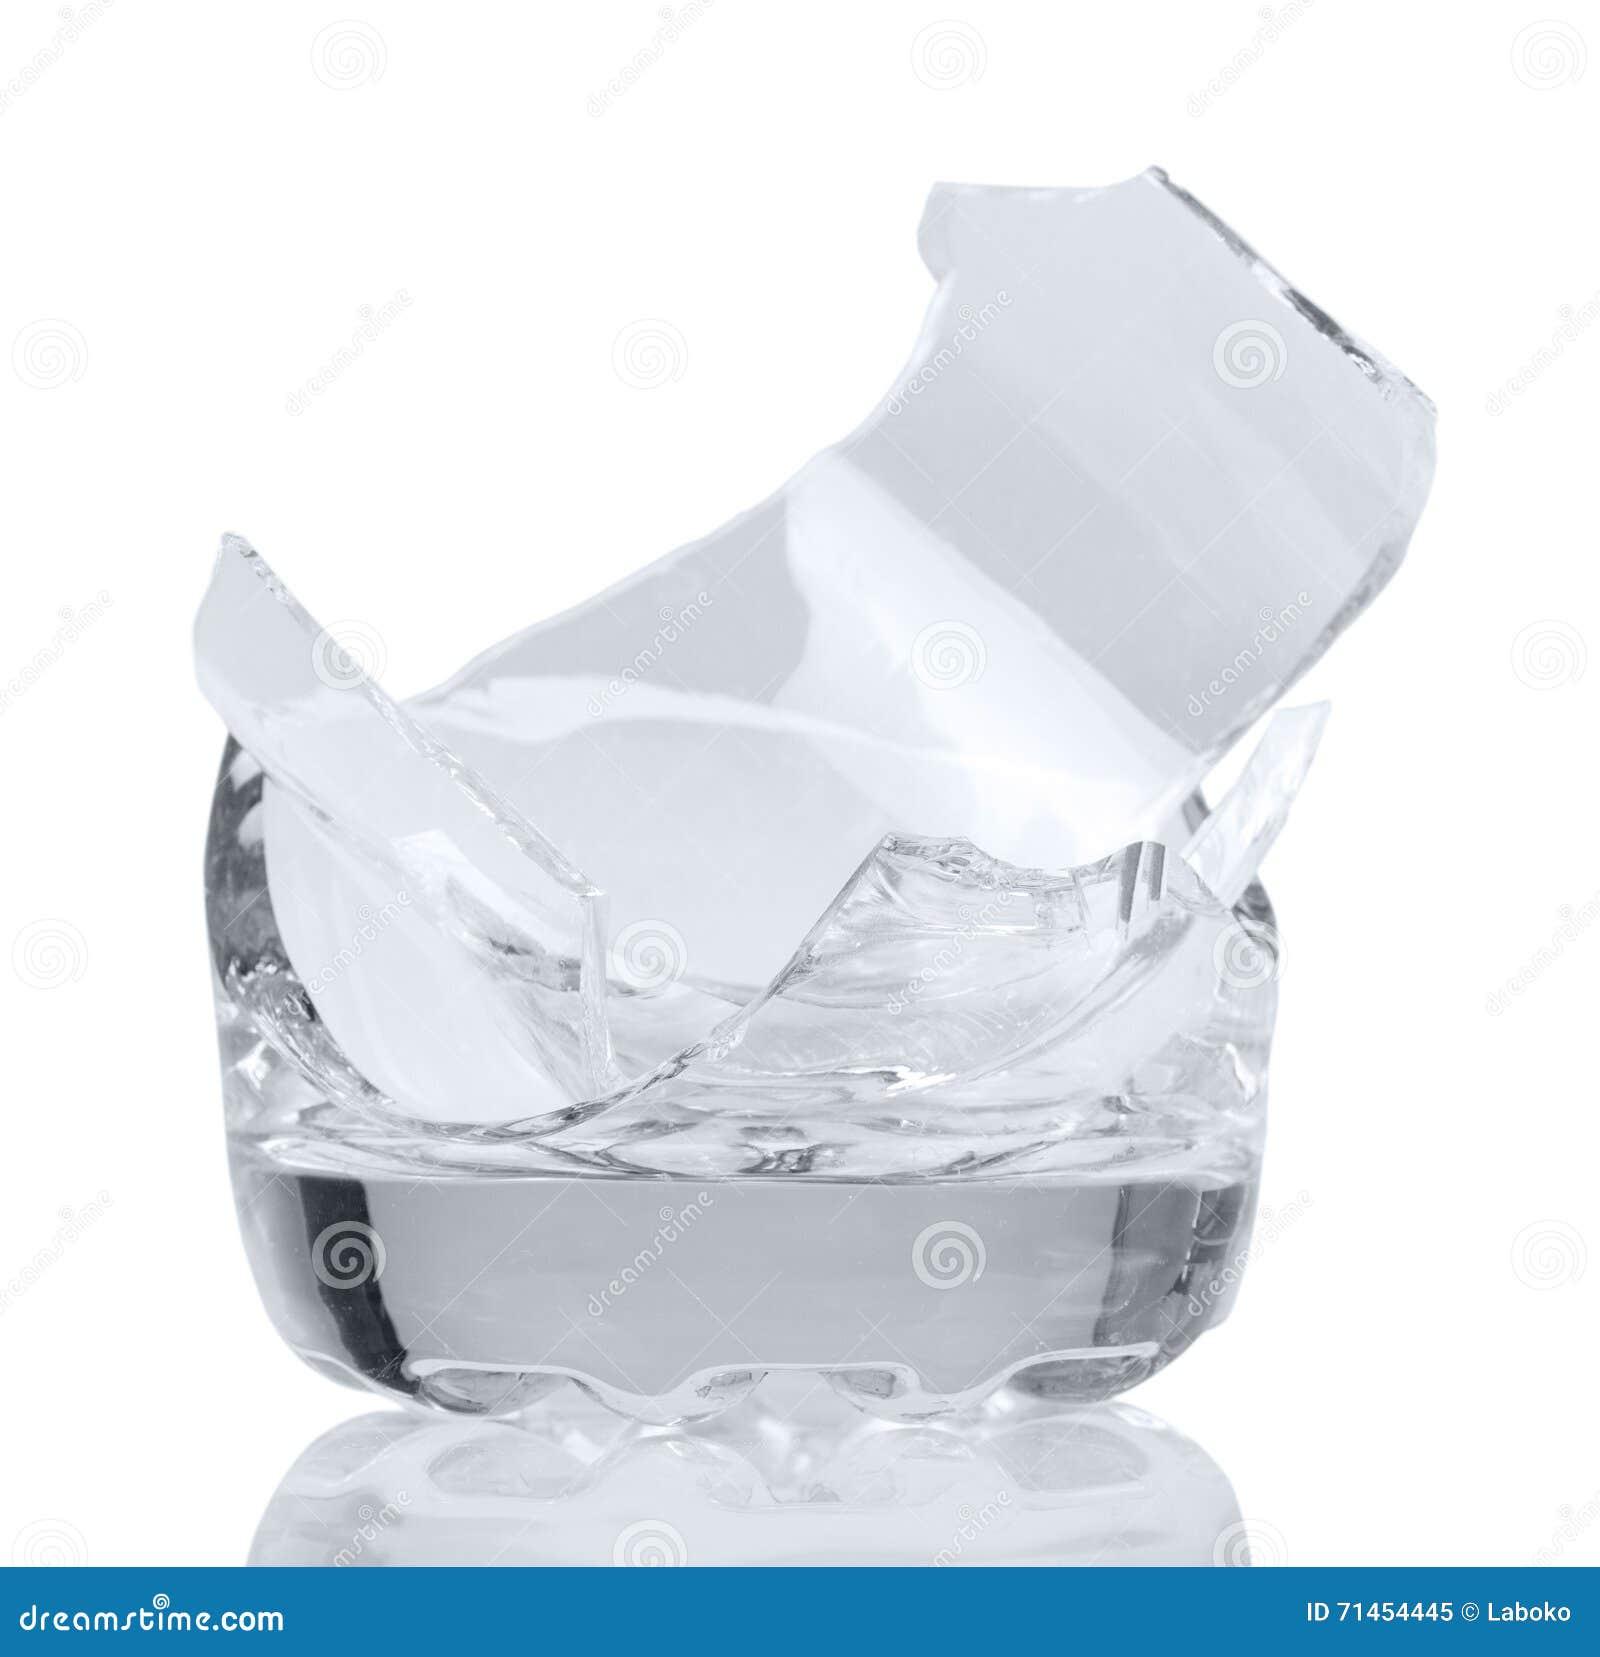 how to fix a broken glass bowl